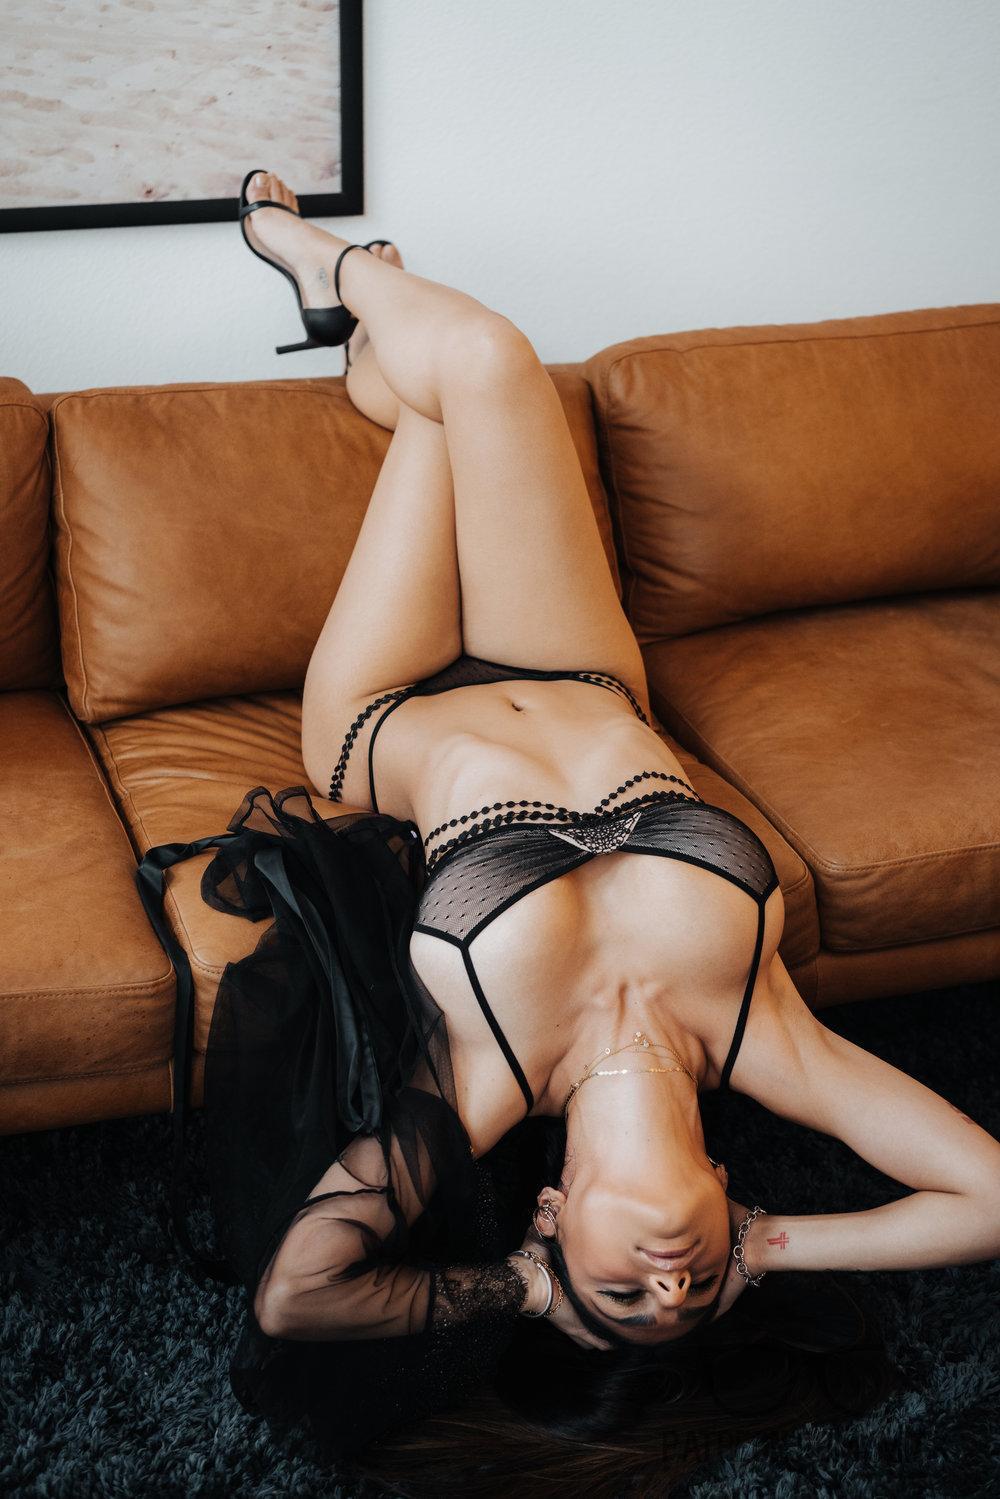 Mia Khalifa Lingerie Stiletto Heels Photoshoot Leaked 0010